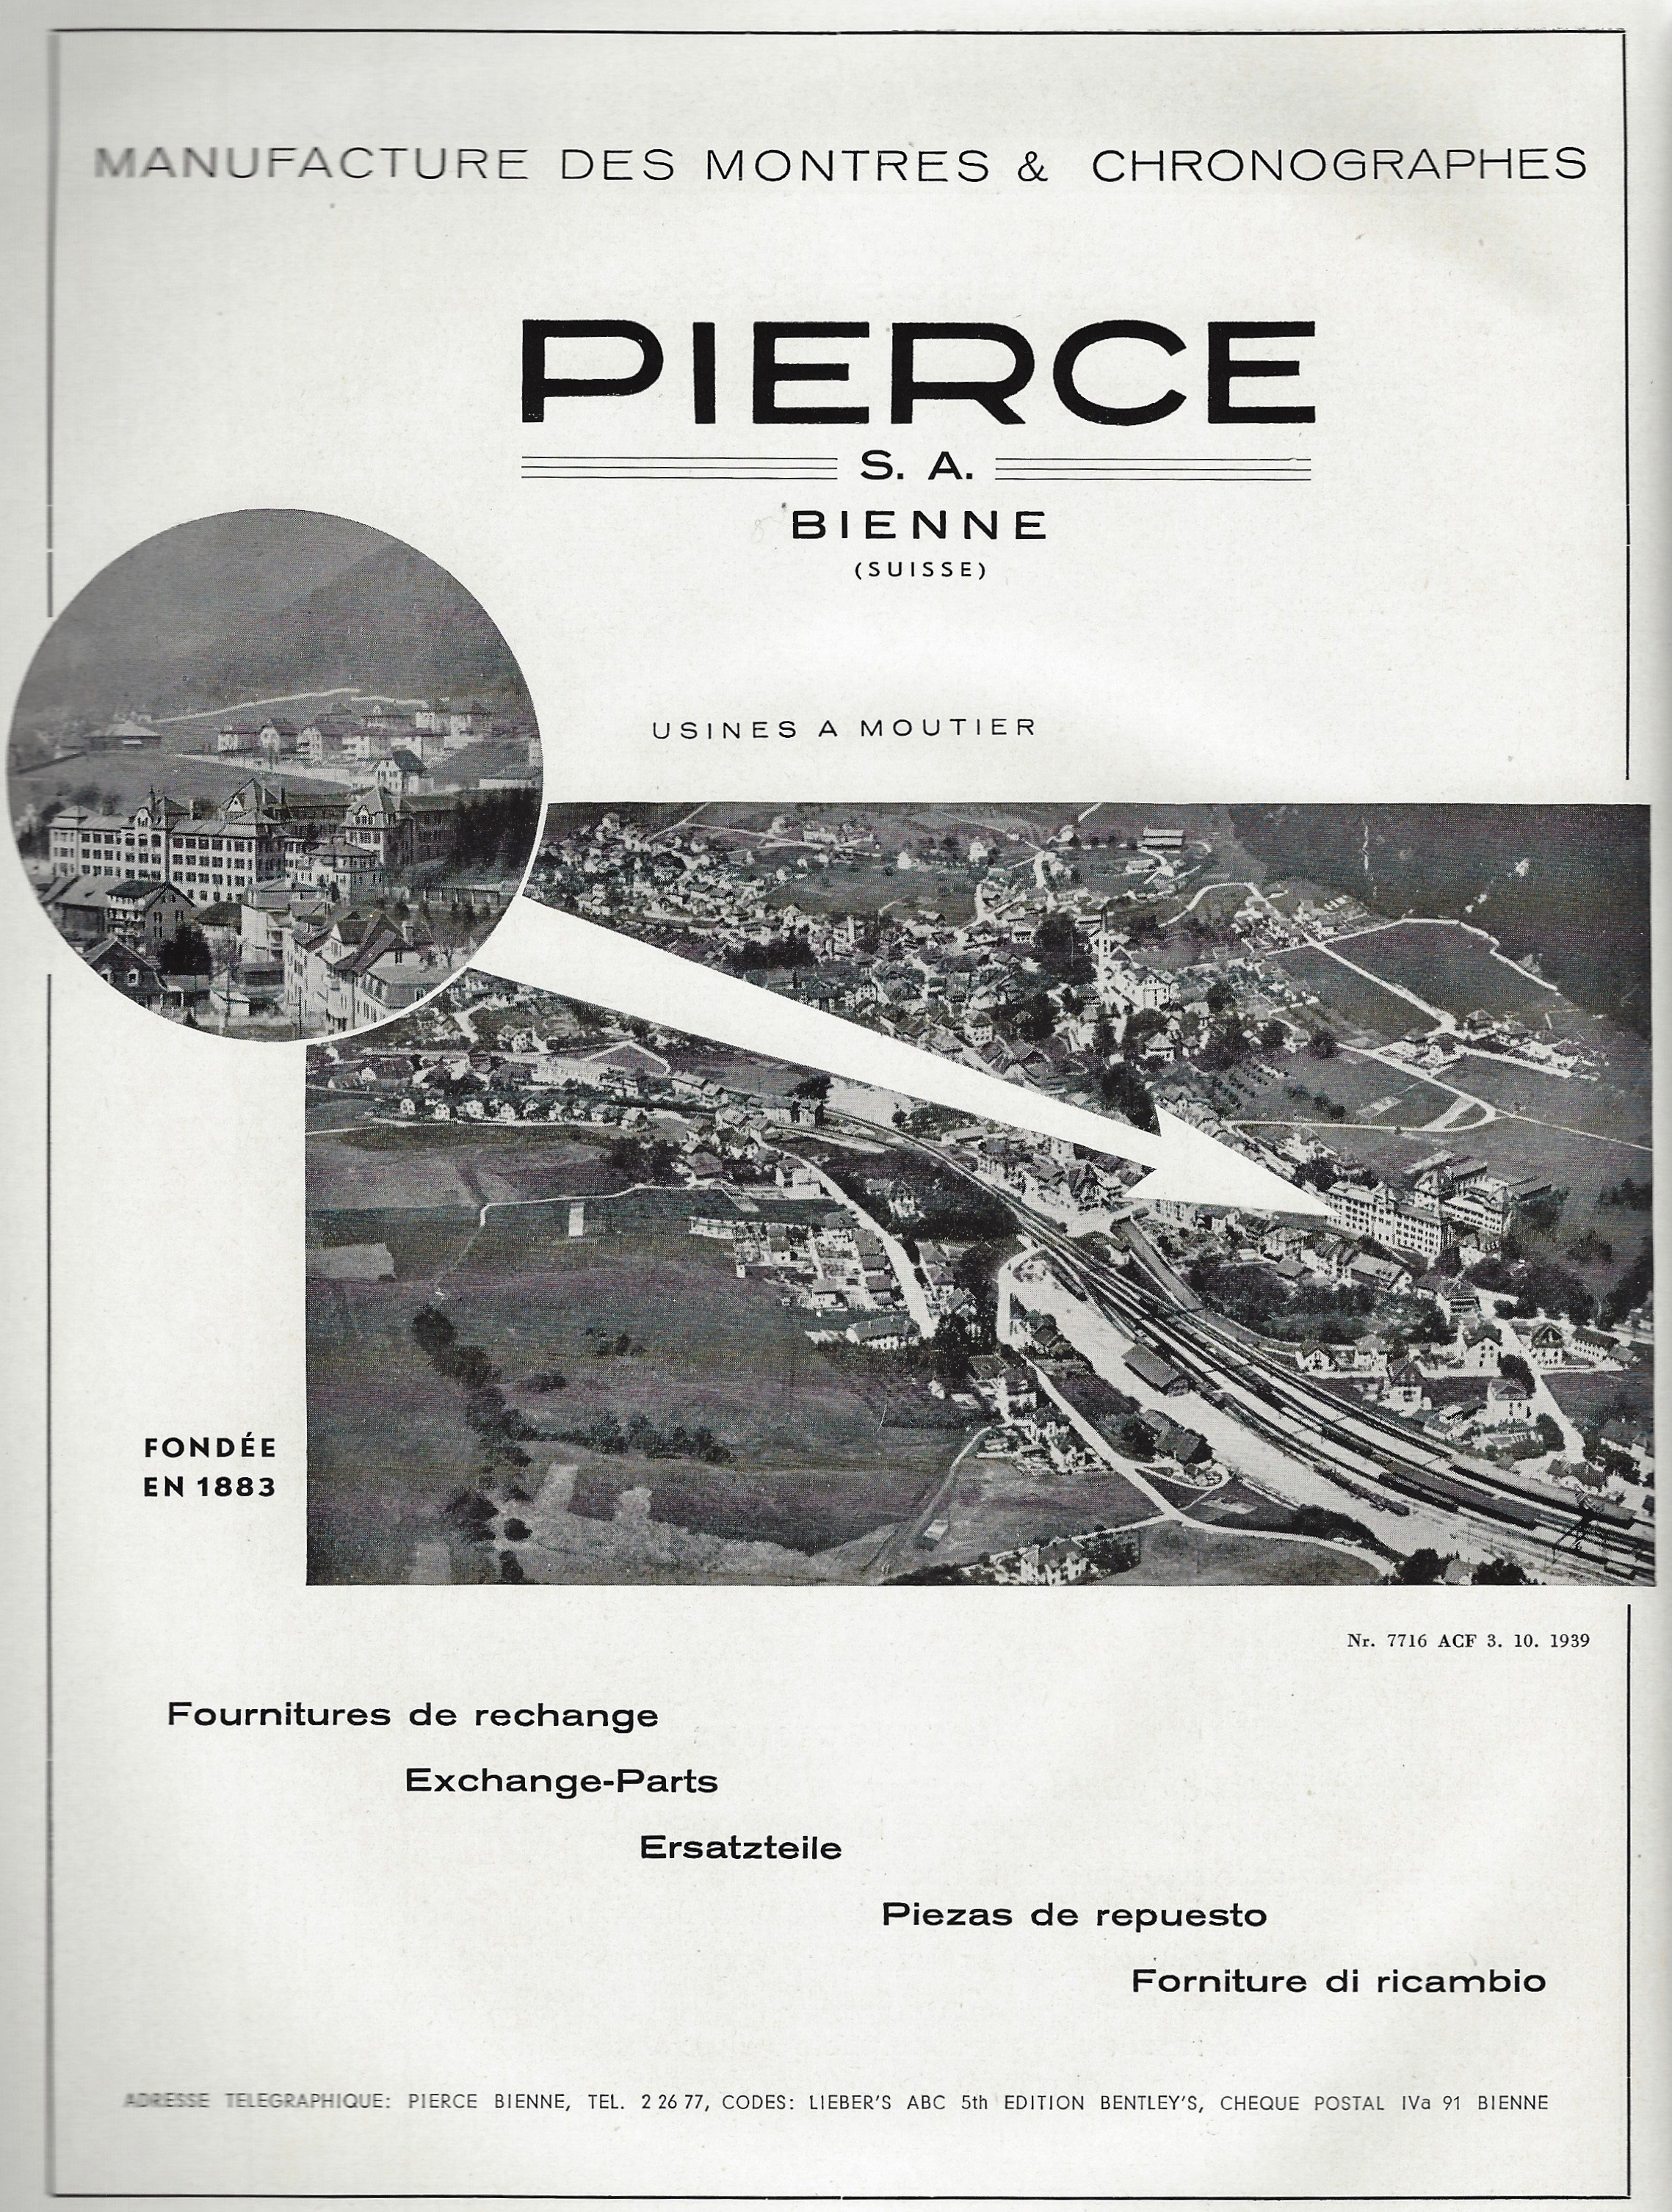 1949 Pierce_SA_Bienne 1949